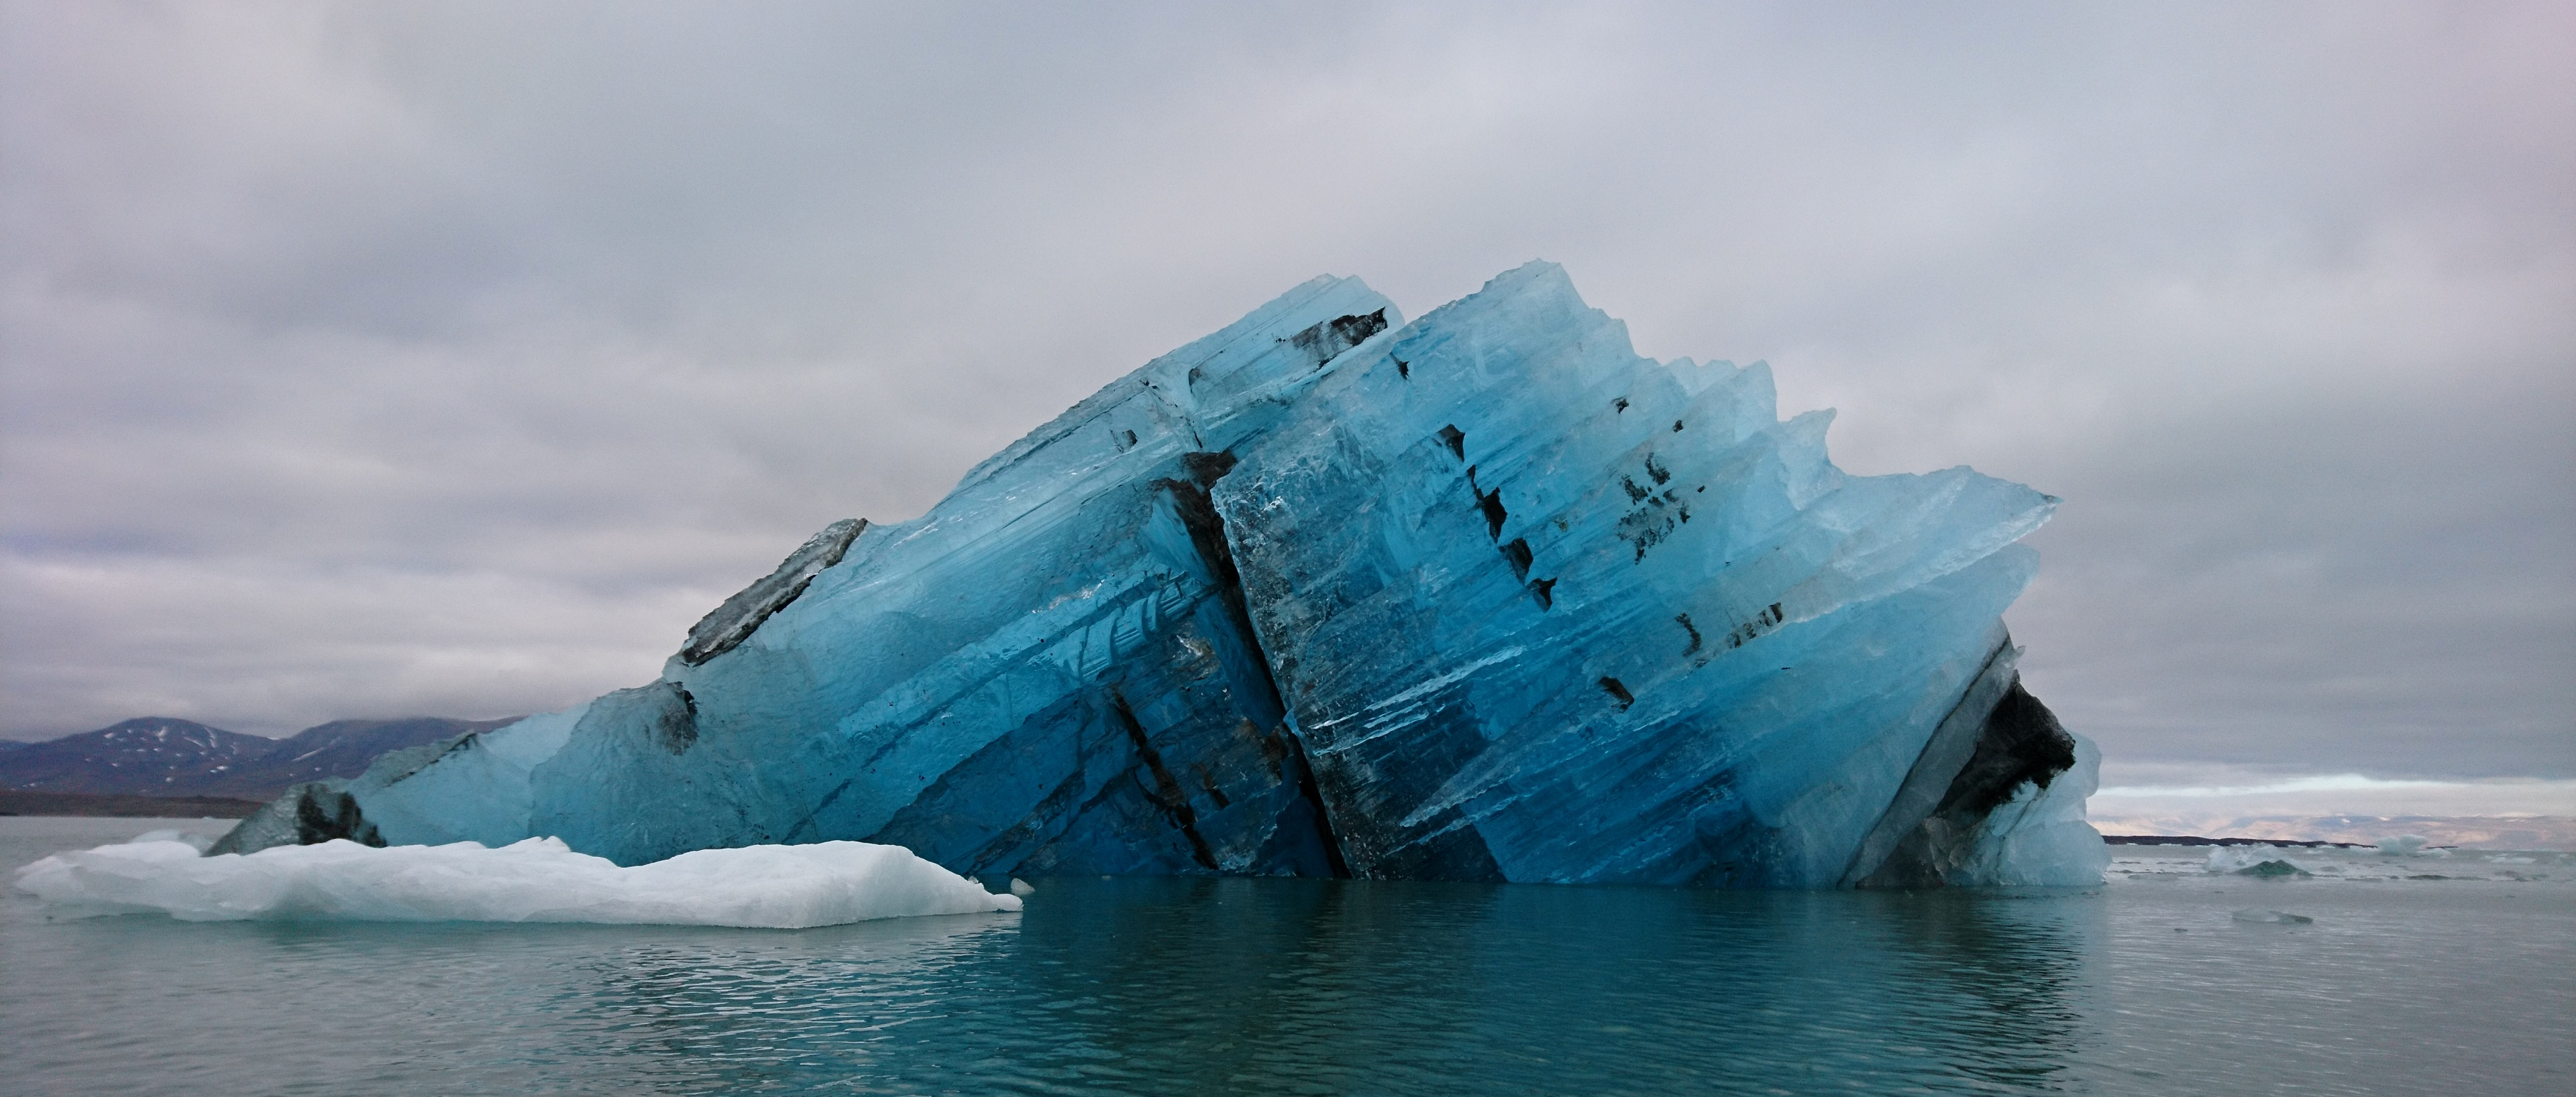 Iceberg banquise 80°Nord Iceberg banquise 80°Nord Iceberg banquise 80°Nord Iceberg banquise 80°Nord